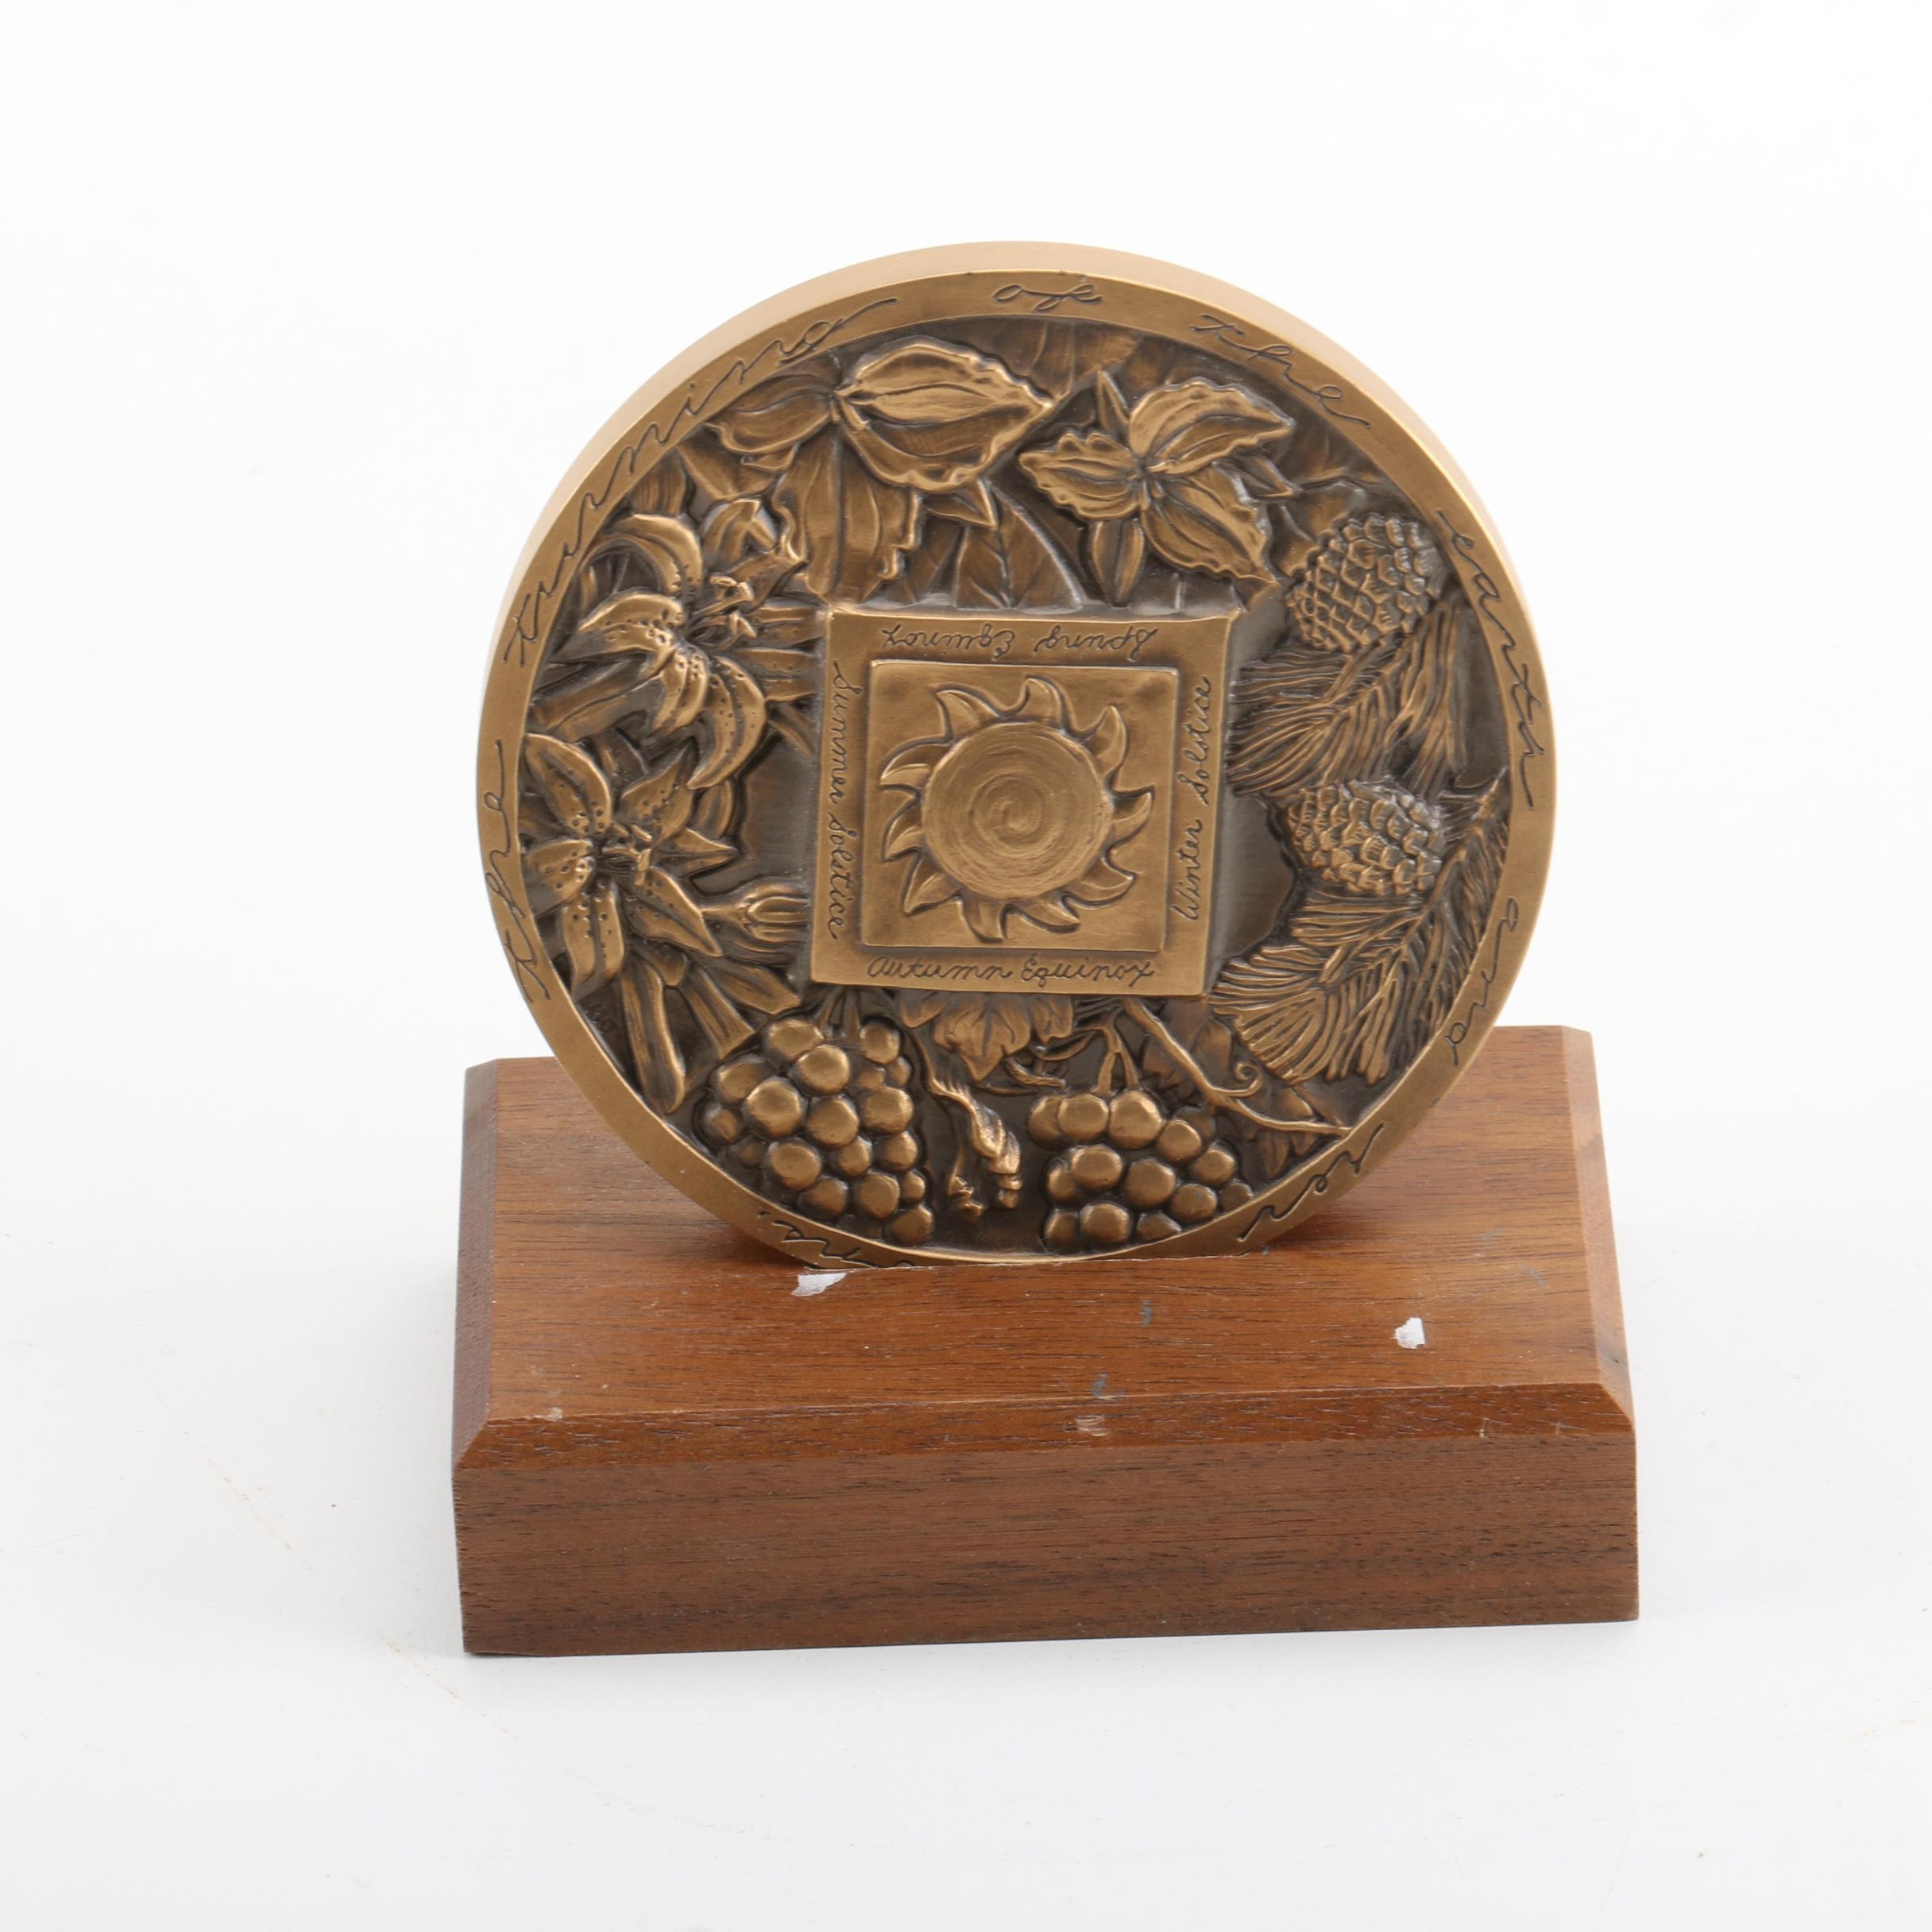 1995 Metal Relief Medallion Calendar